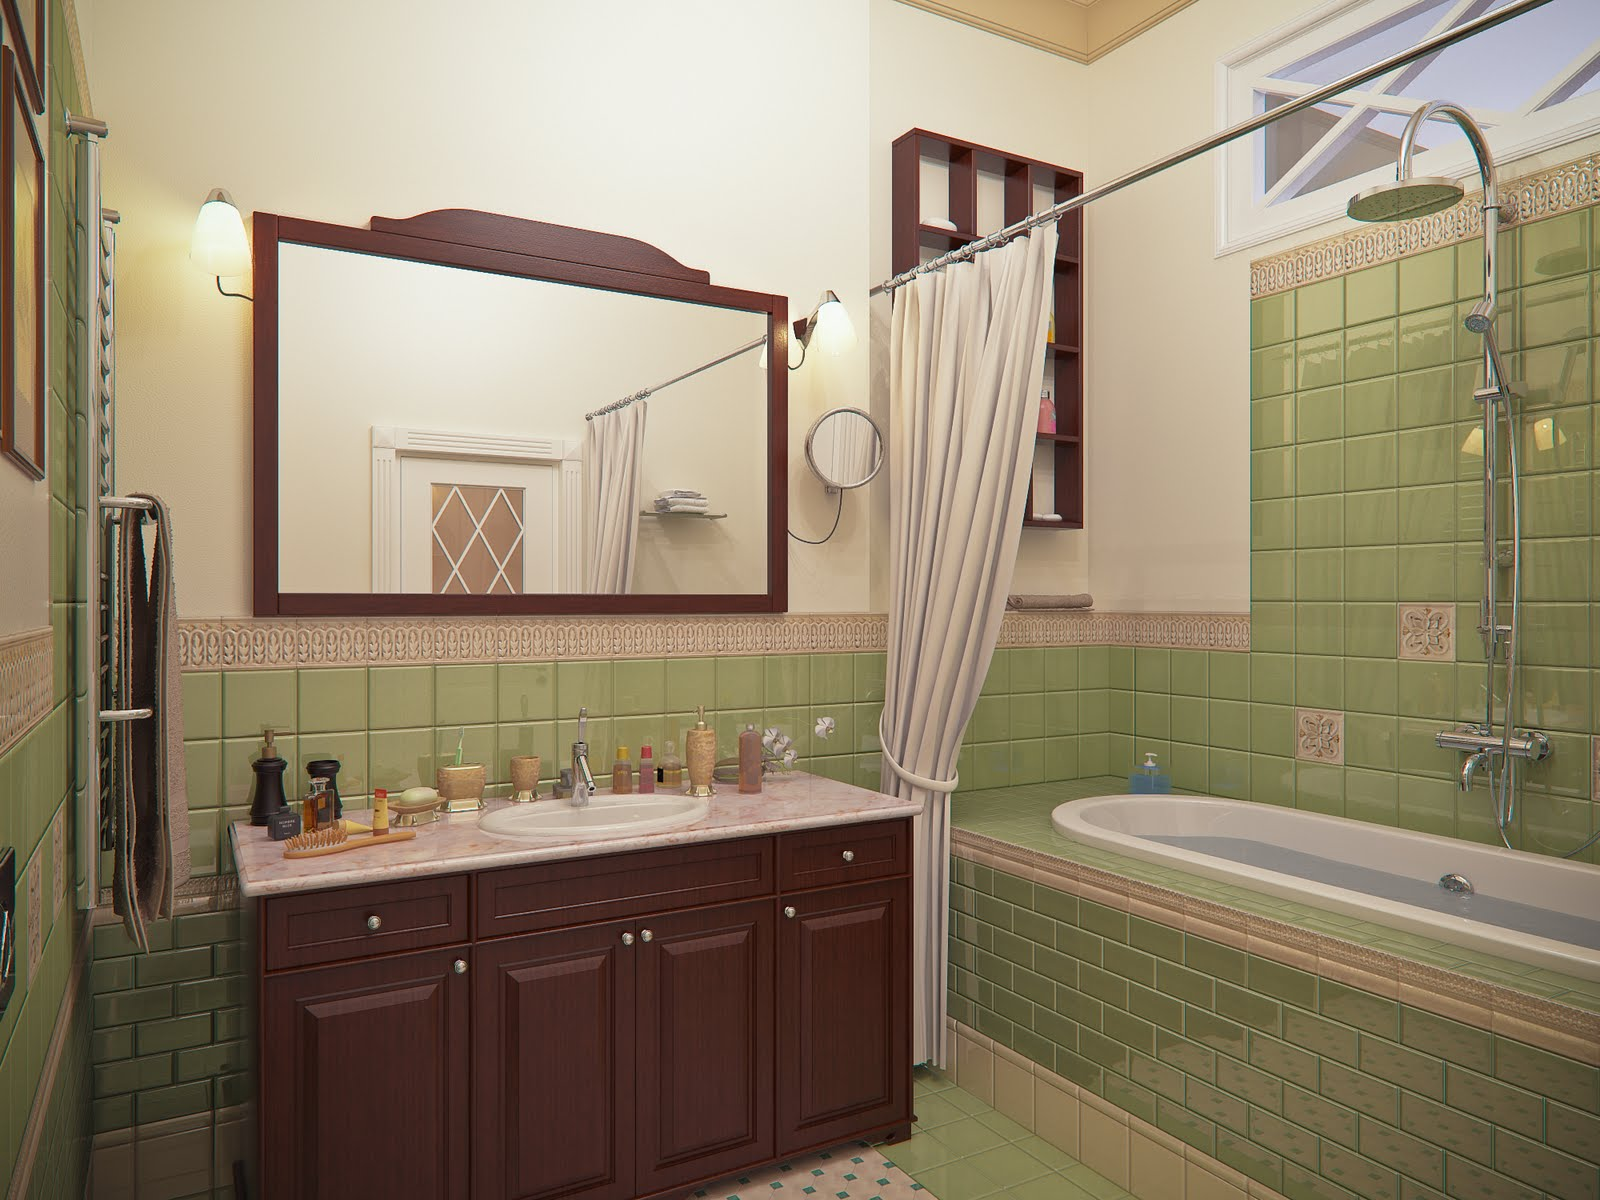 http://sam-sebe-dizainer.com/public/images/Ремонтируем ванную качественно